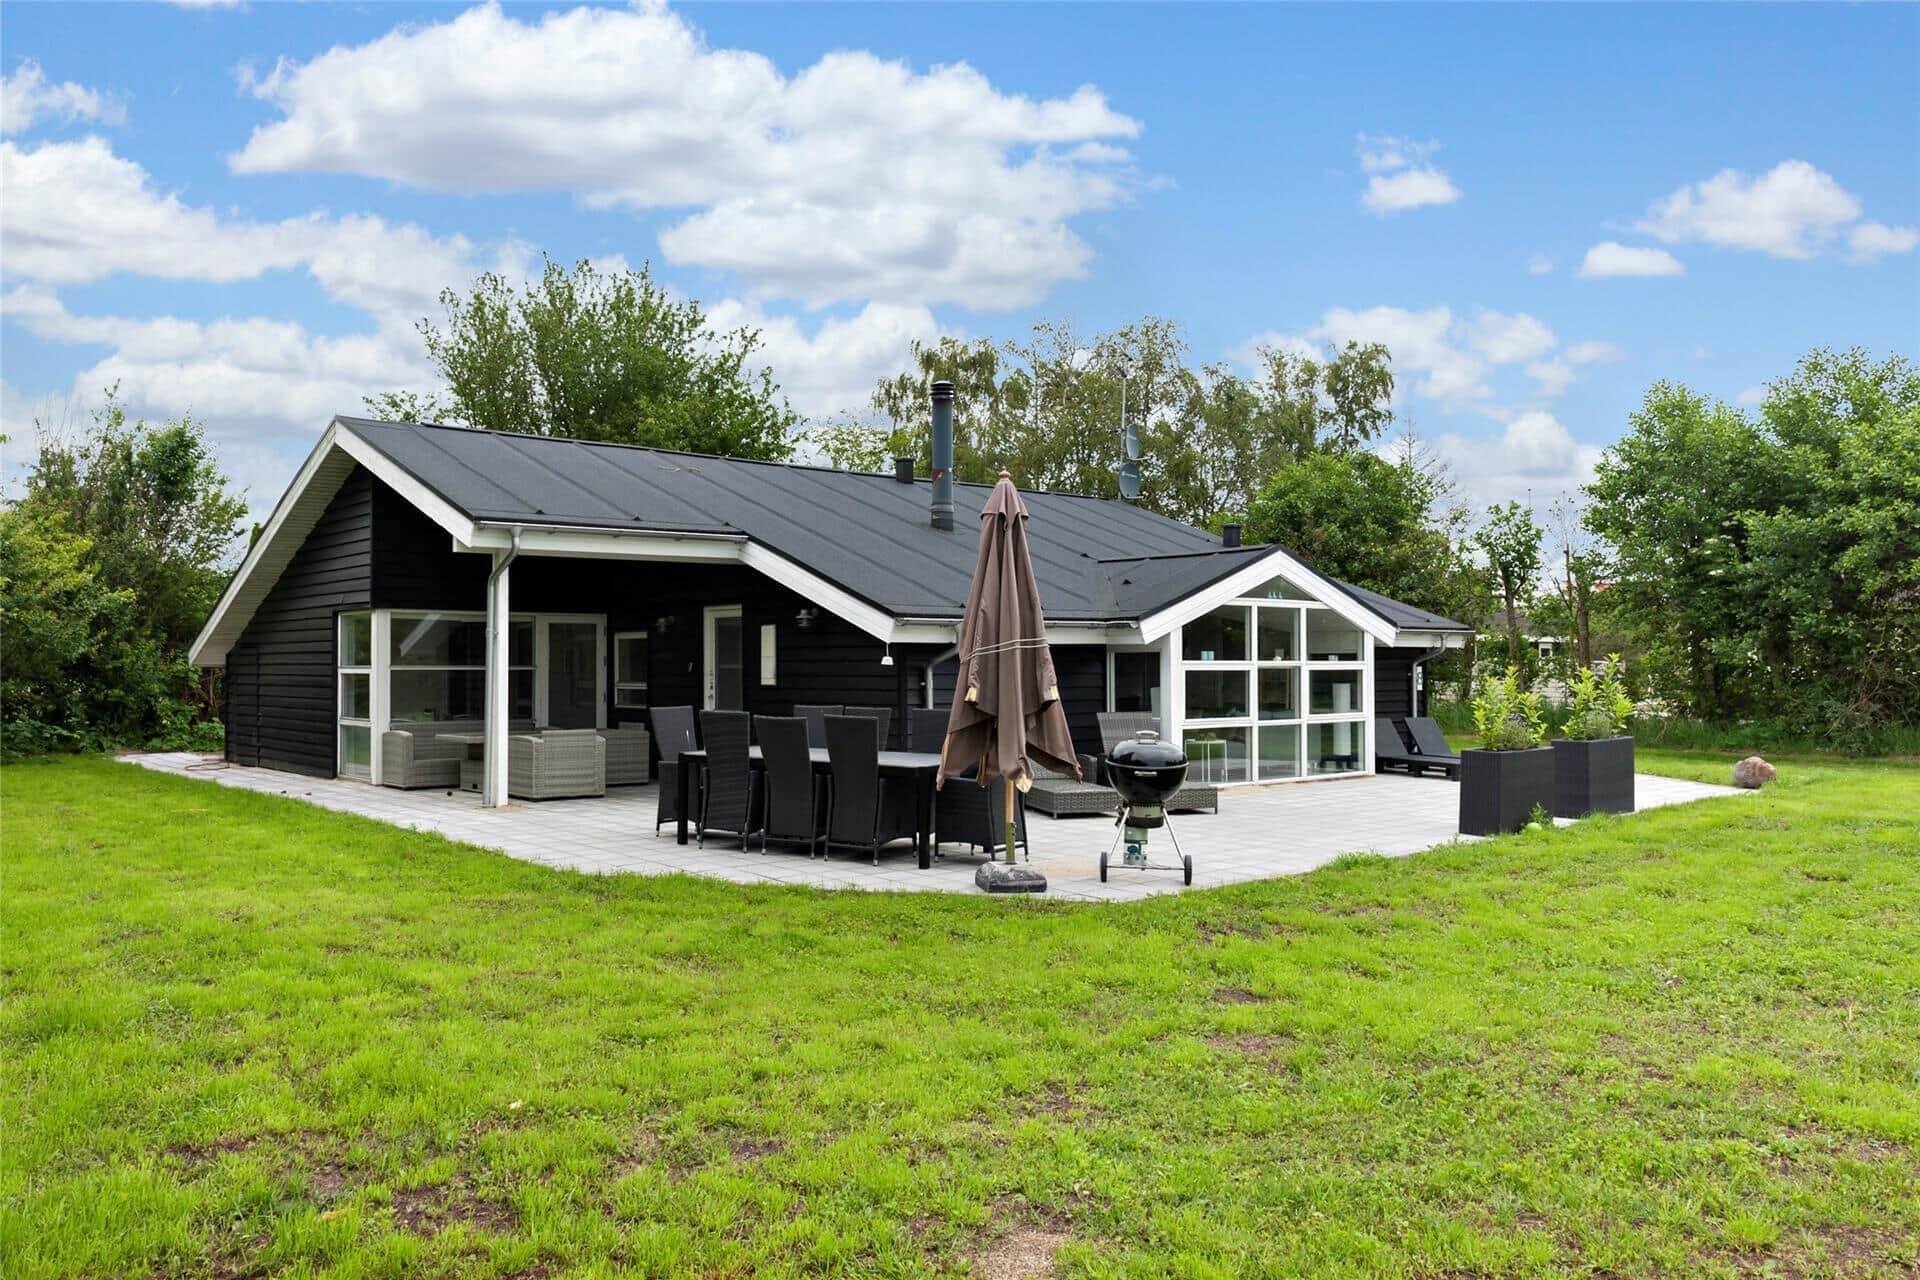 Afbeelding 1-23 Vakantiehuis 8473, Åvej 8, DK - 8400 Ebeltoft